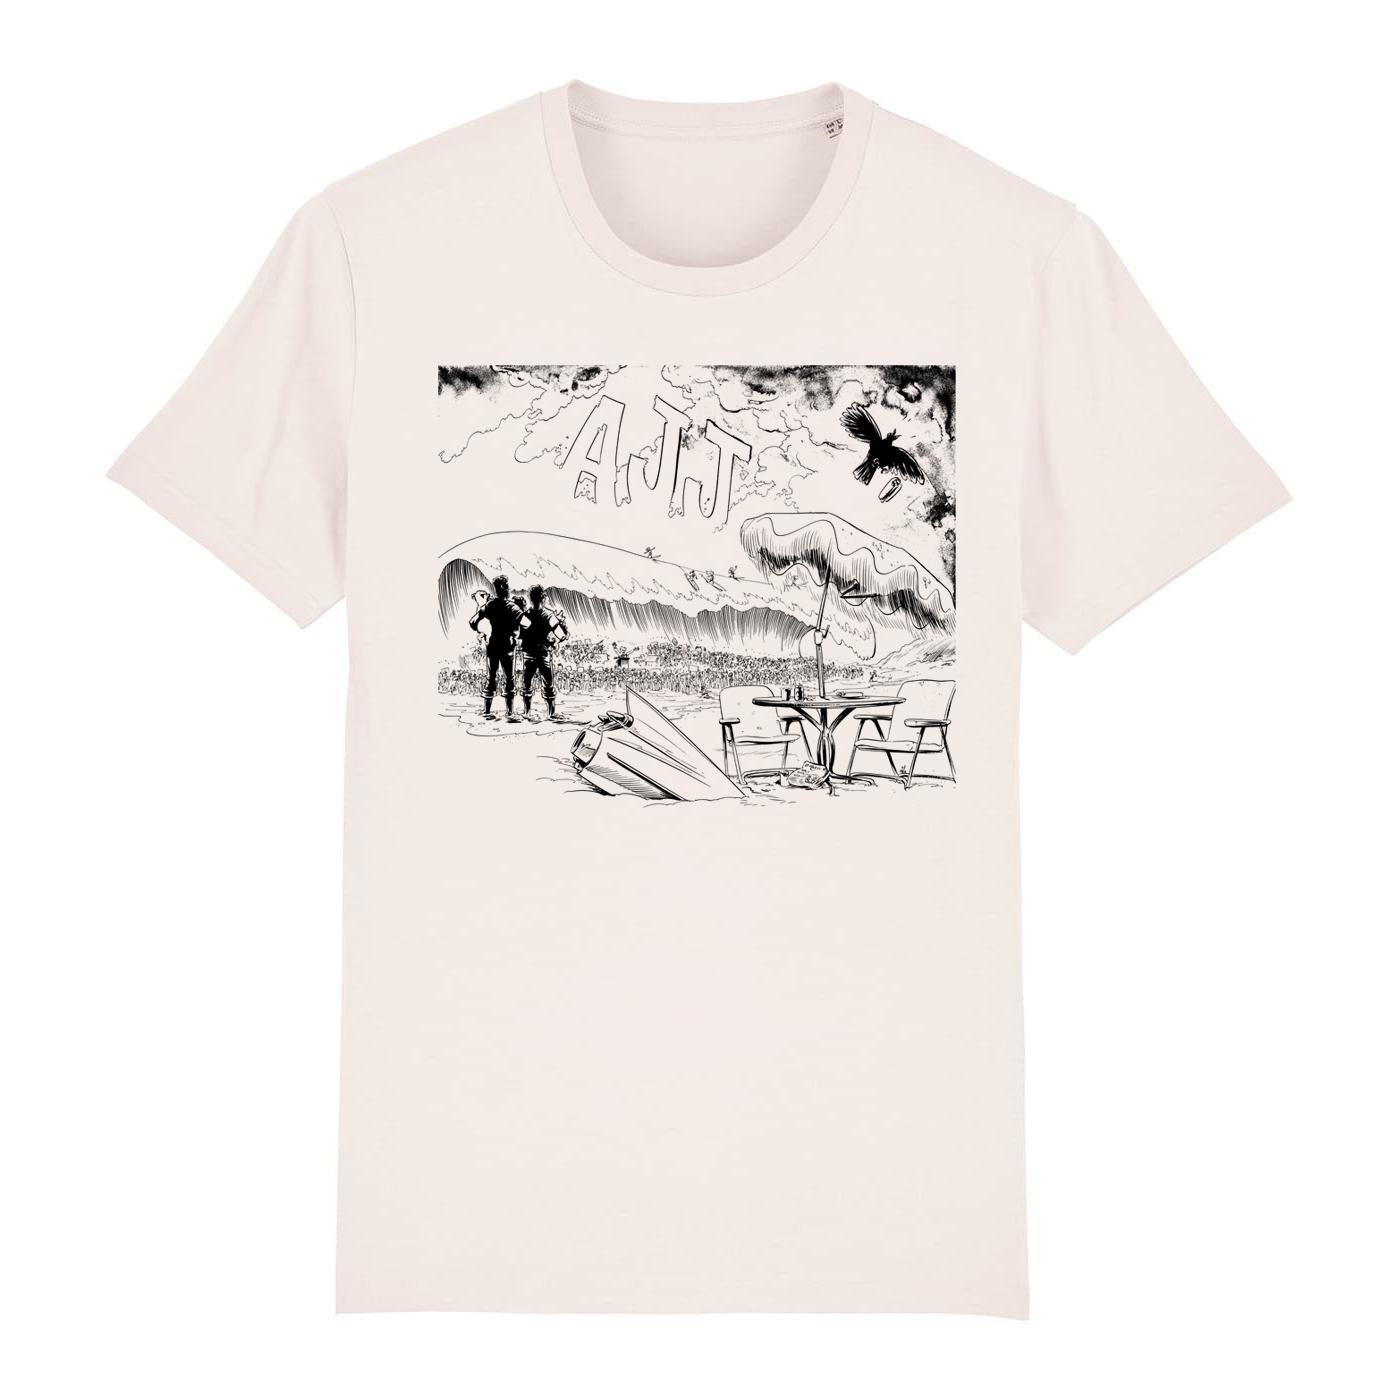 AJJ - Good Luck Everybody Shirt